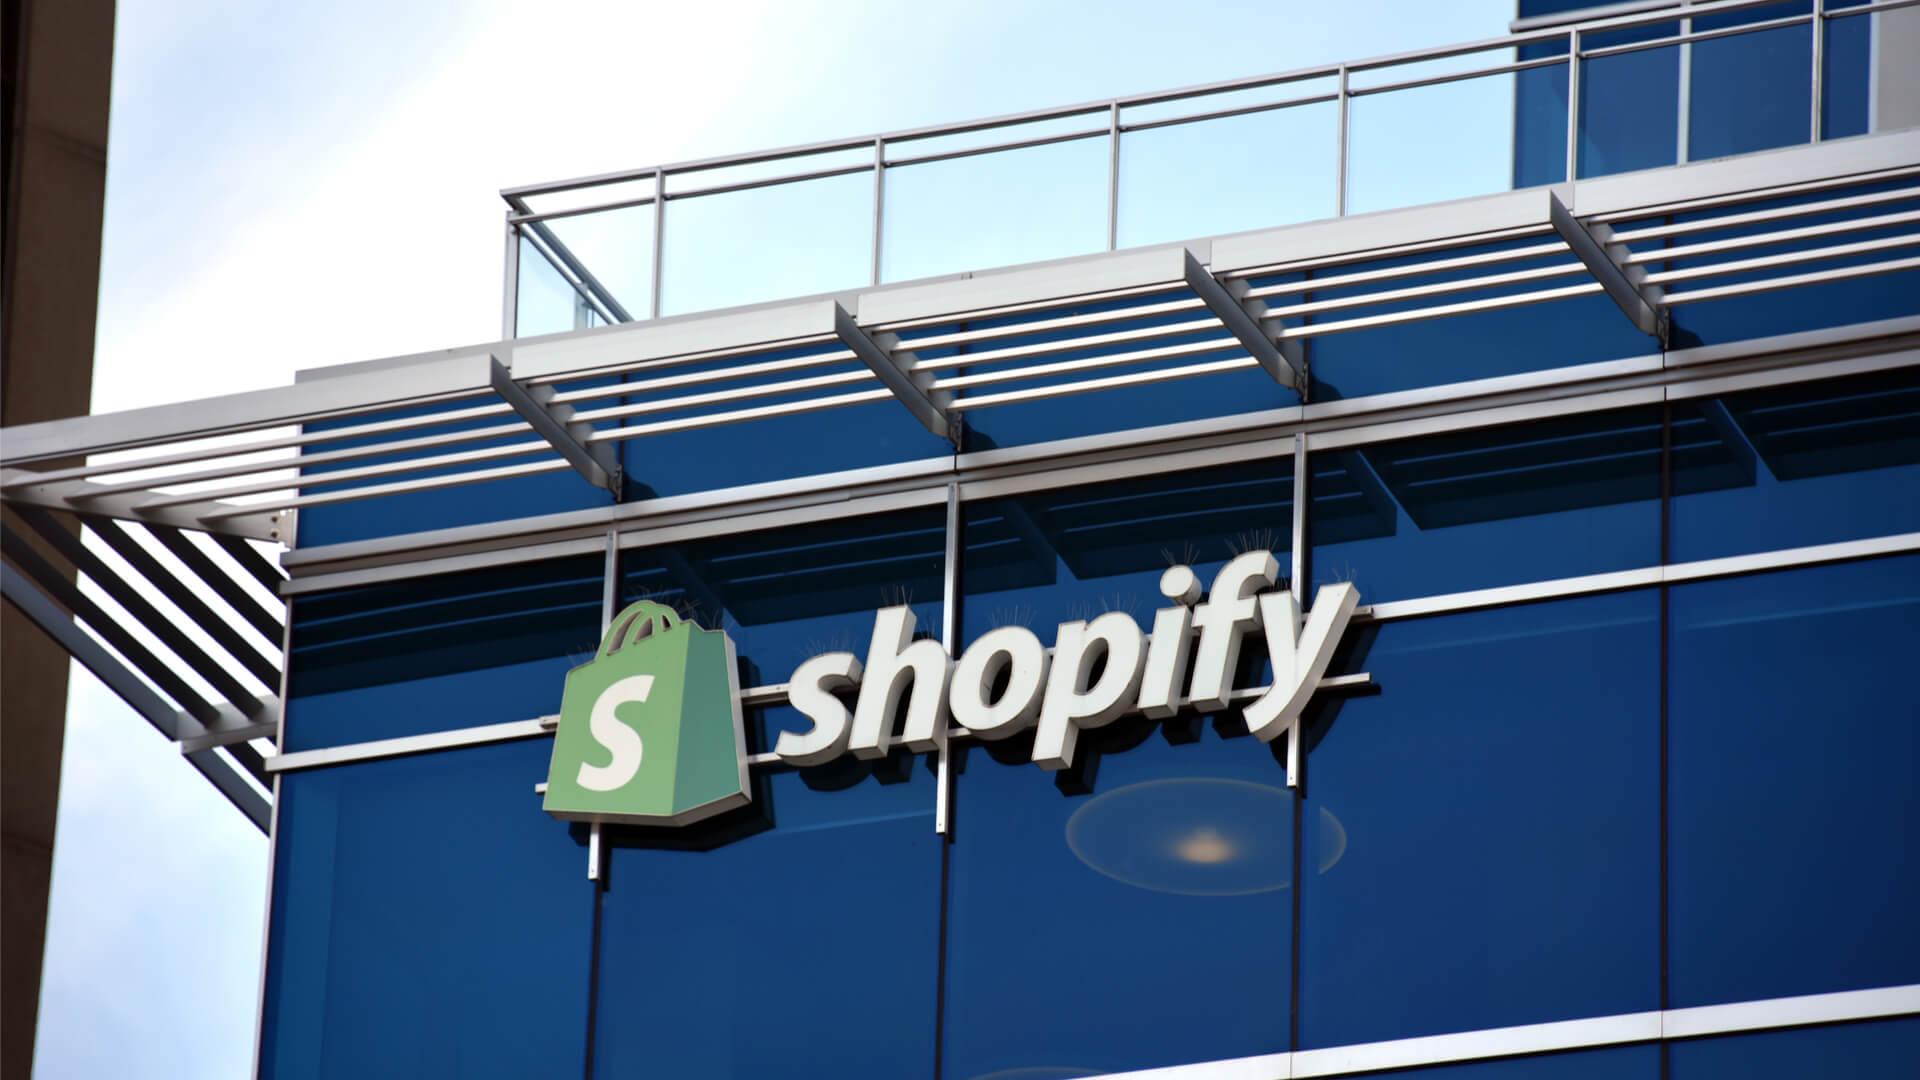 Setup a US company to sell on Shopify